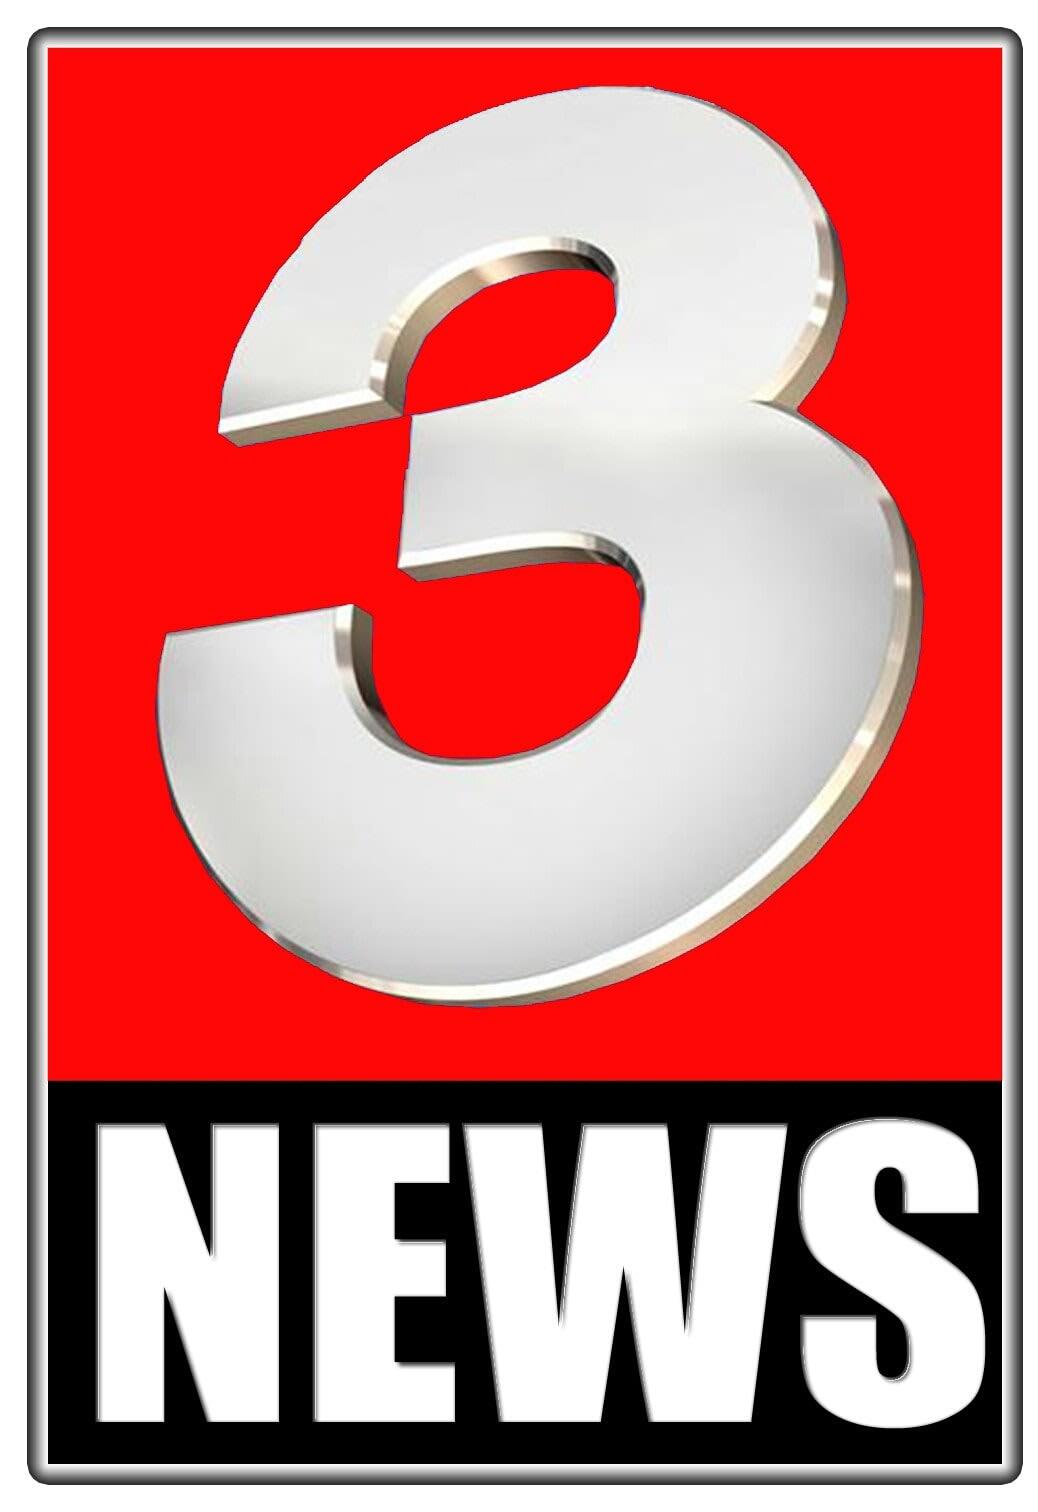 3 NEWS